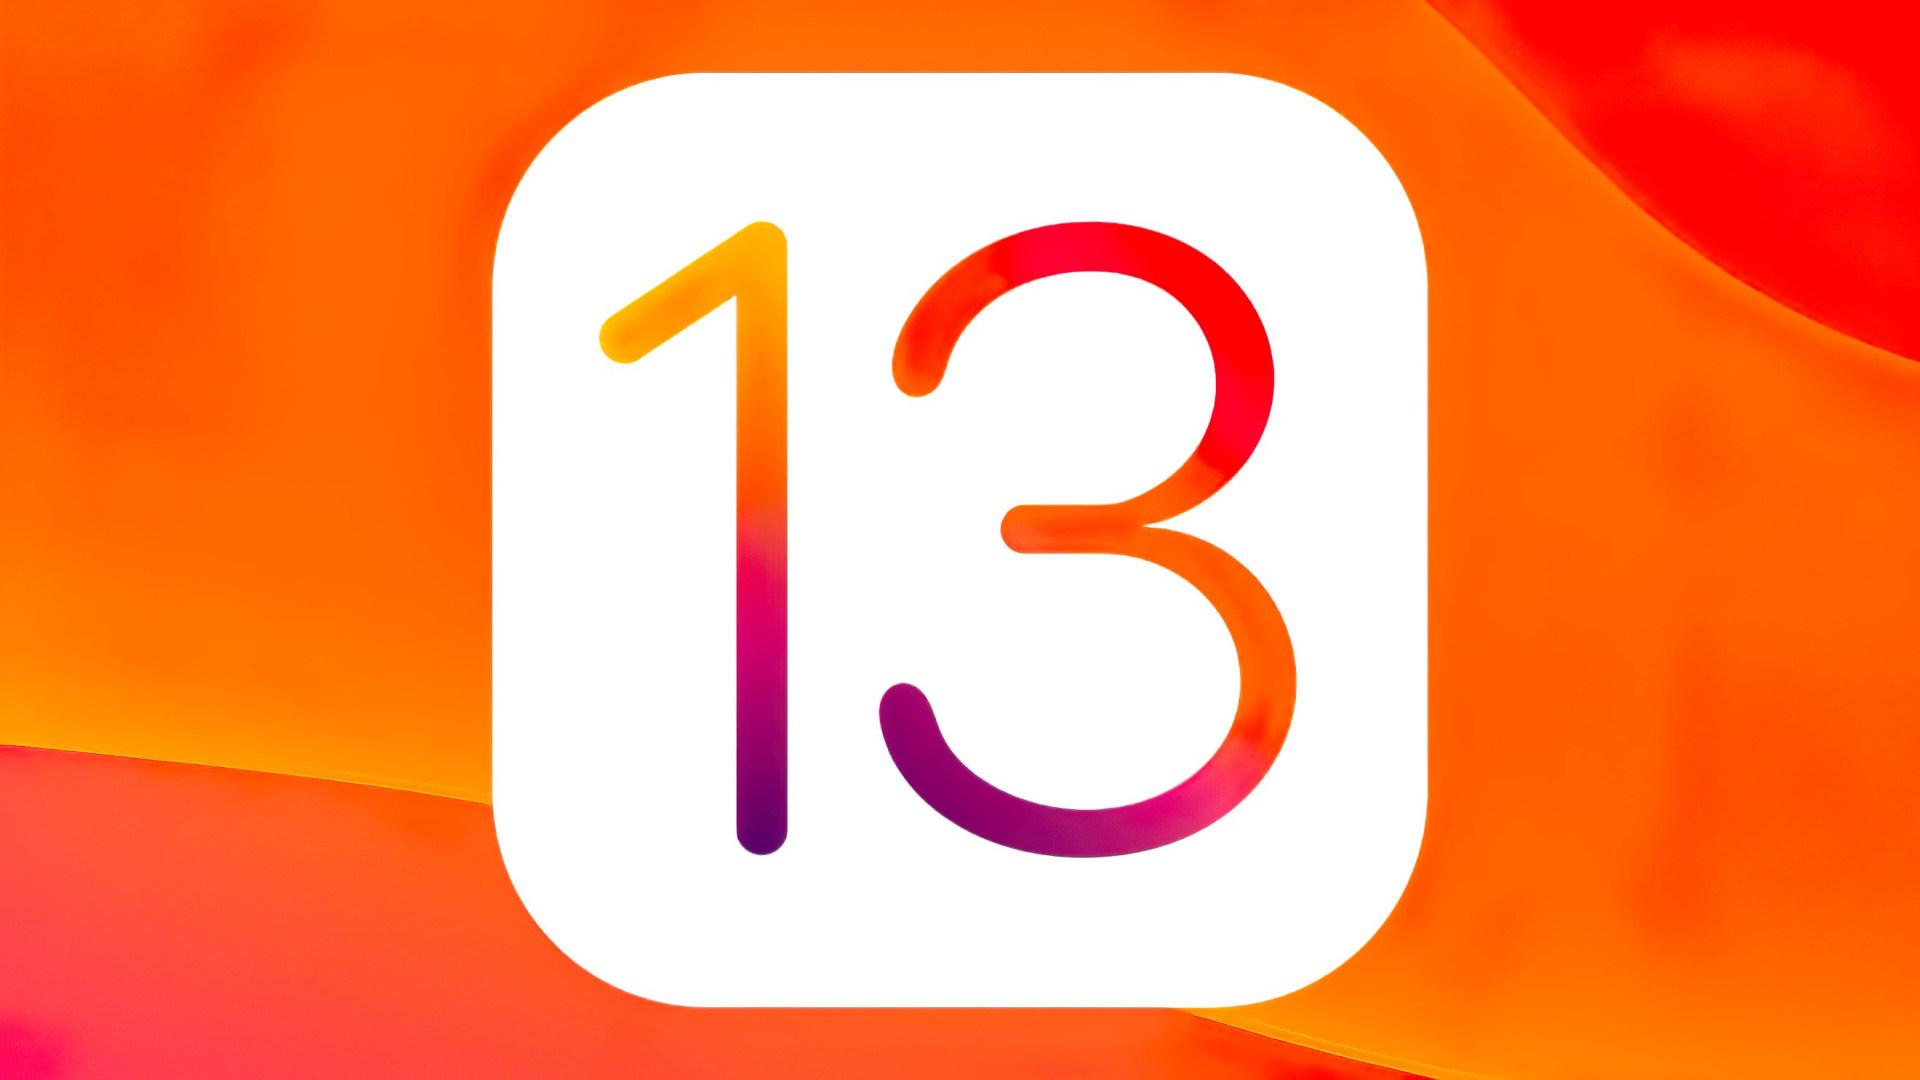 Betriebssystem, Apple, Iphone, Logo, Software, iOS 13